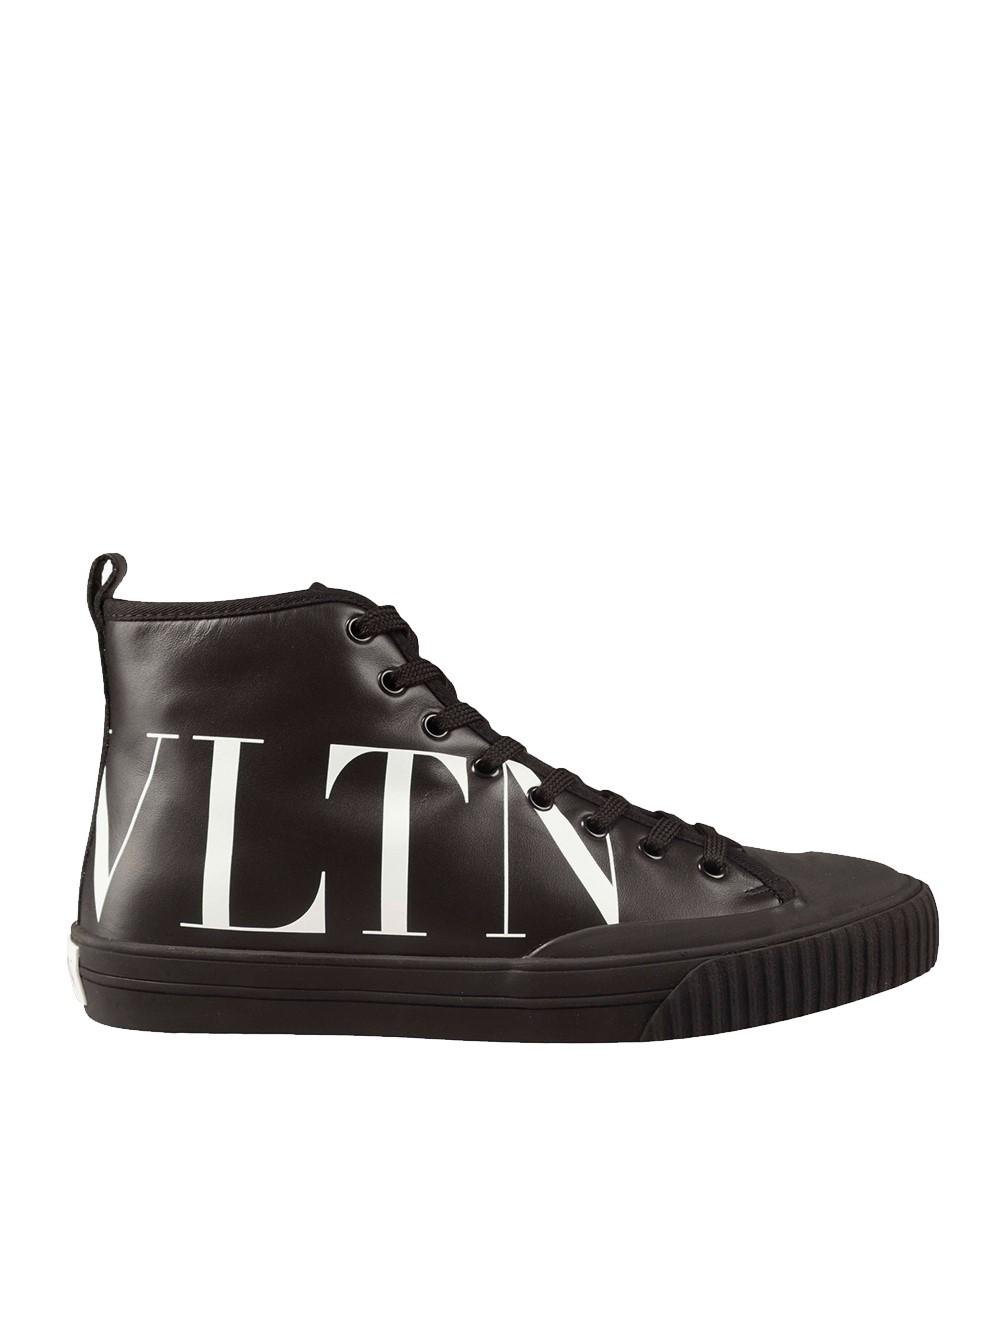 Su Garavani 25383 Alte Valentino Vltn Sneakers Logo TkPXOZiu